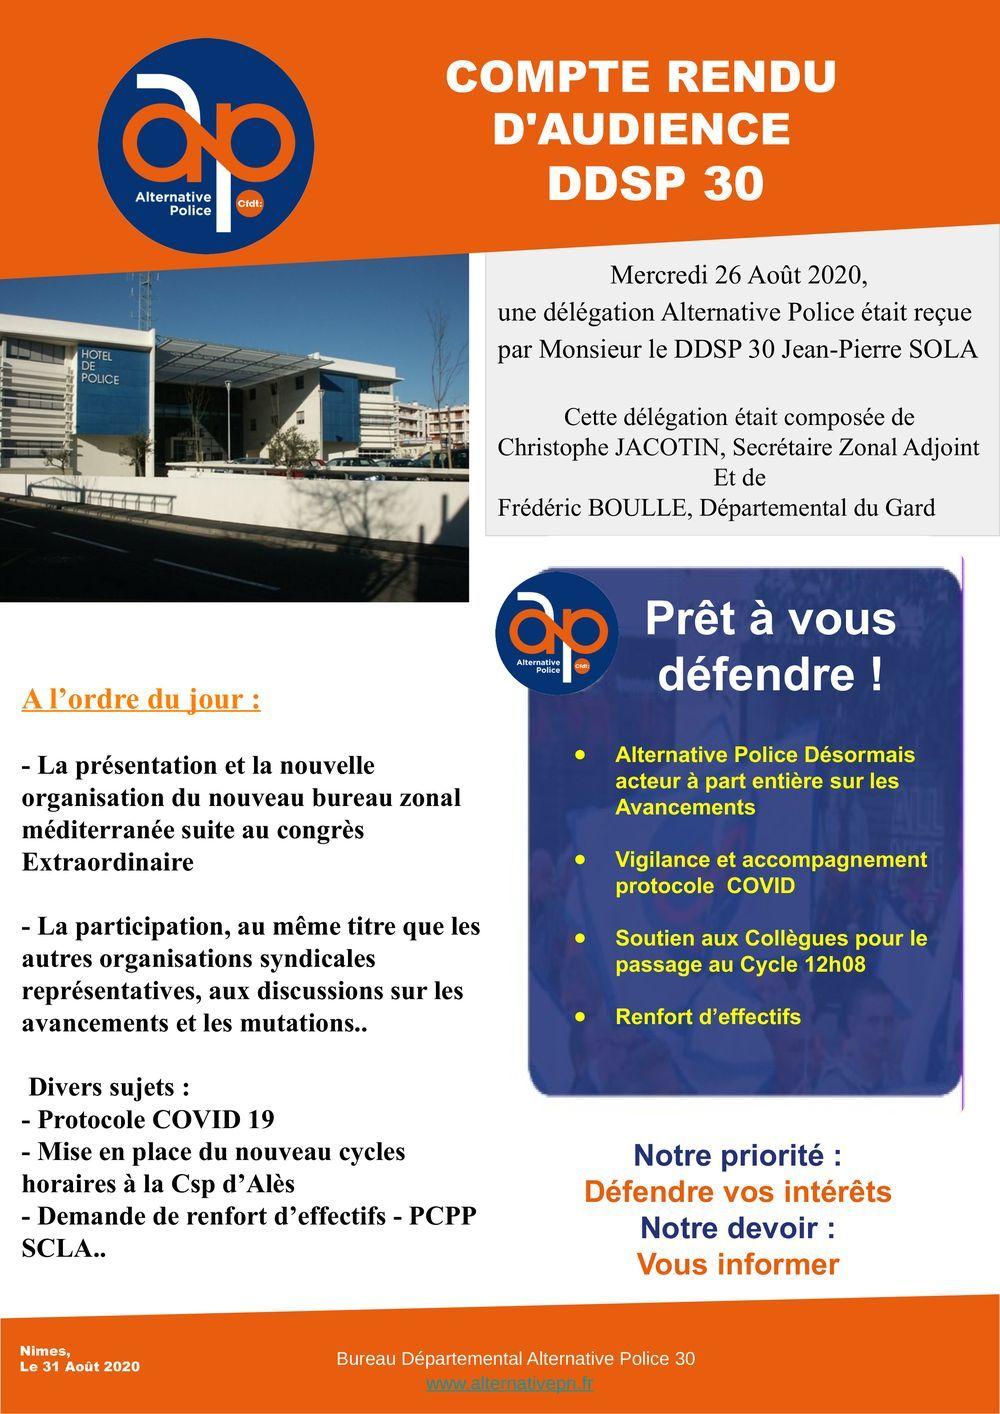 COMPTE RENDU D'AUDIENCE DDSP 30